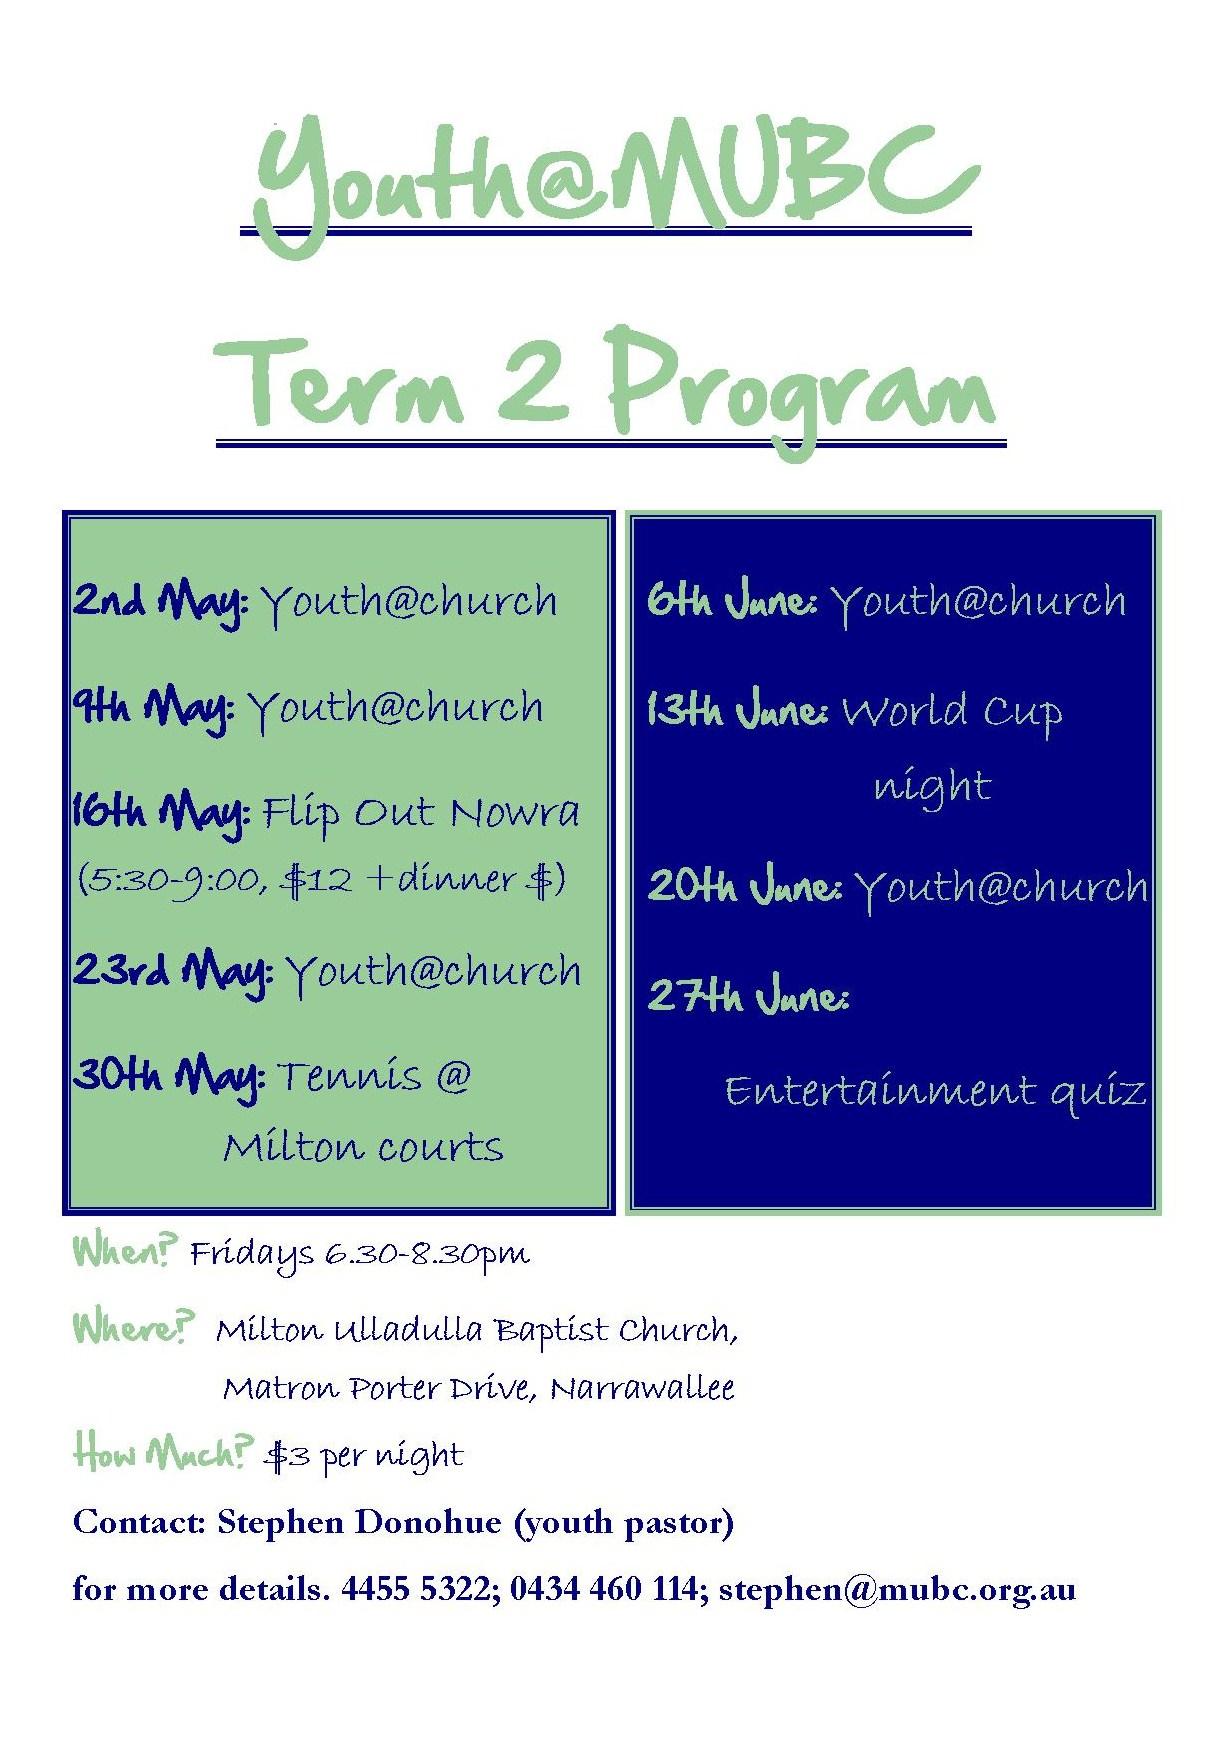 Term 2 2014 program